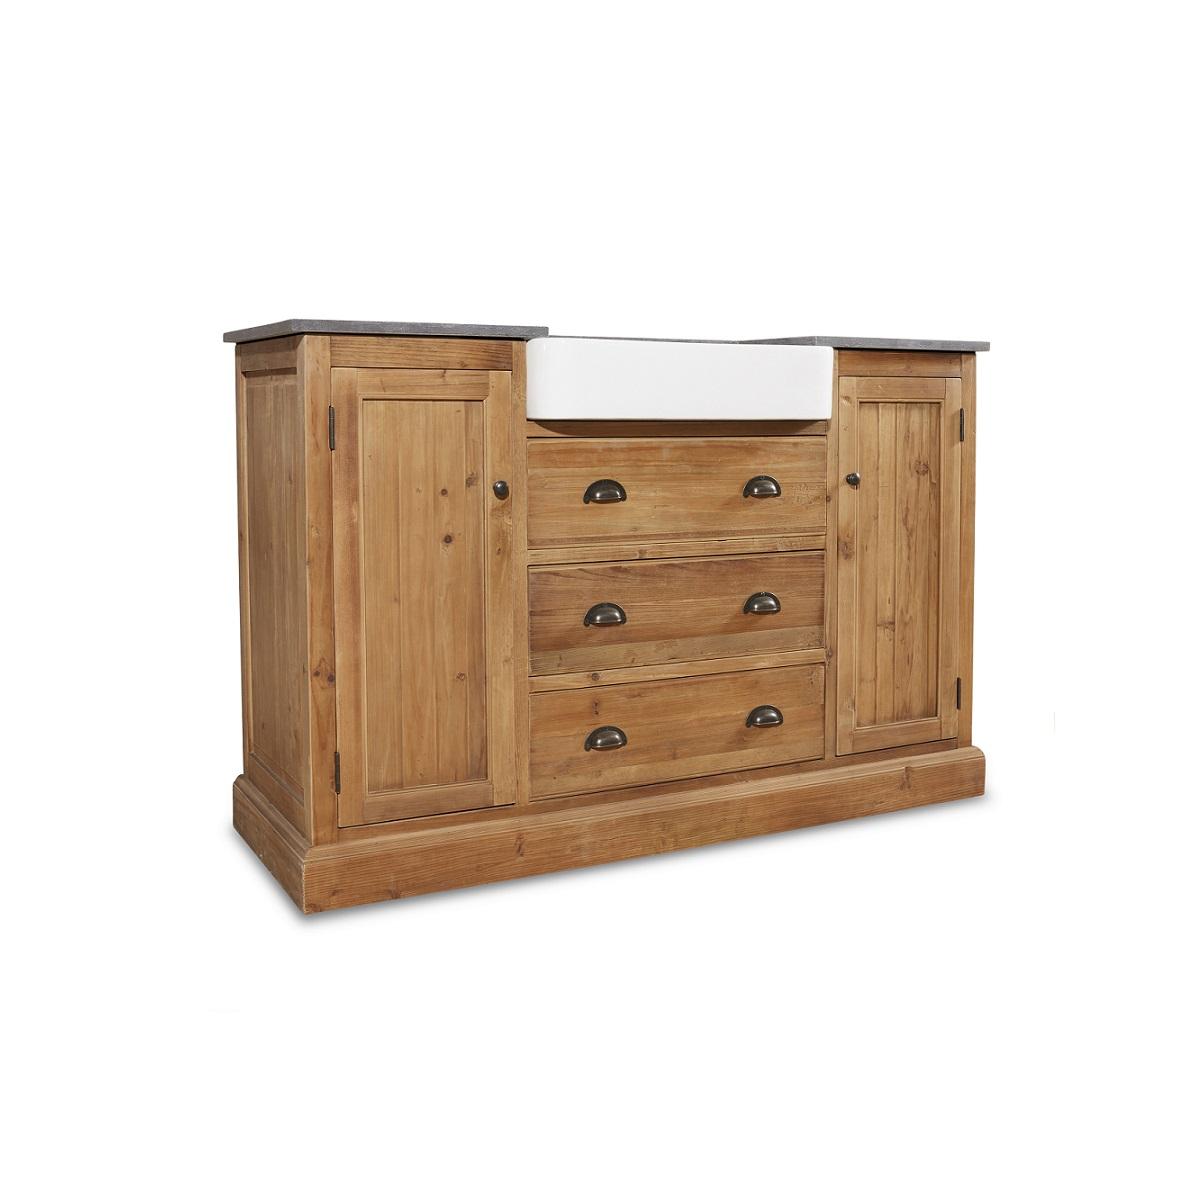 "54"" Handcrafted Reclaimed Pine Solid Wood Single Belgium Sink Bath Vanity"